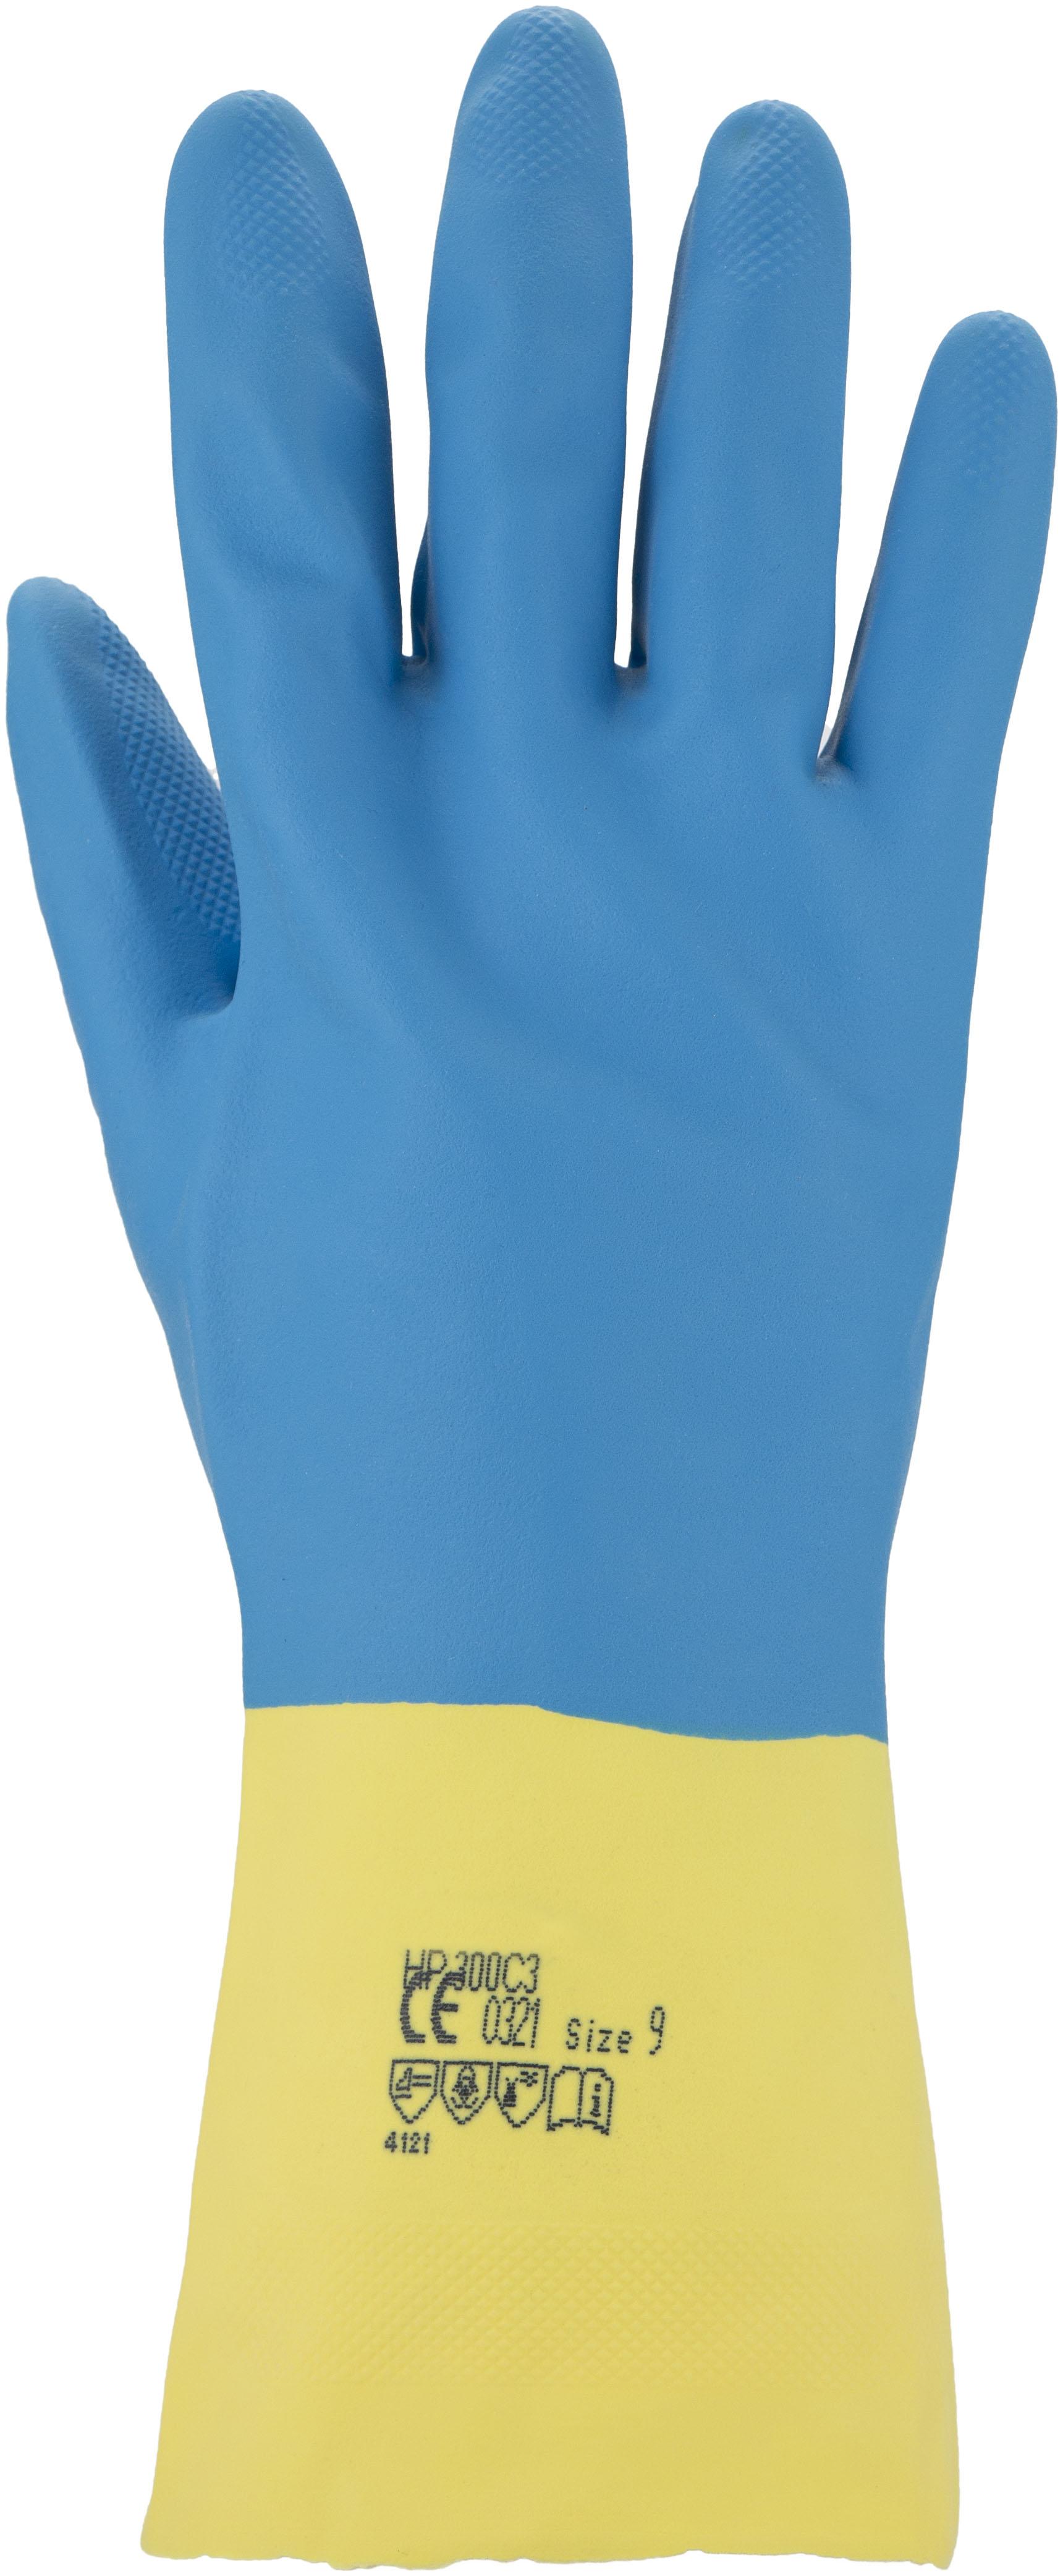 Chemikalienschutzhandschuh Latex blau